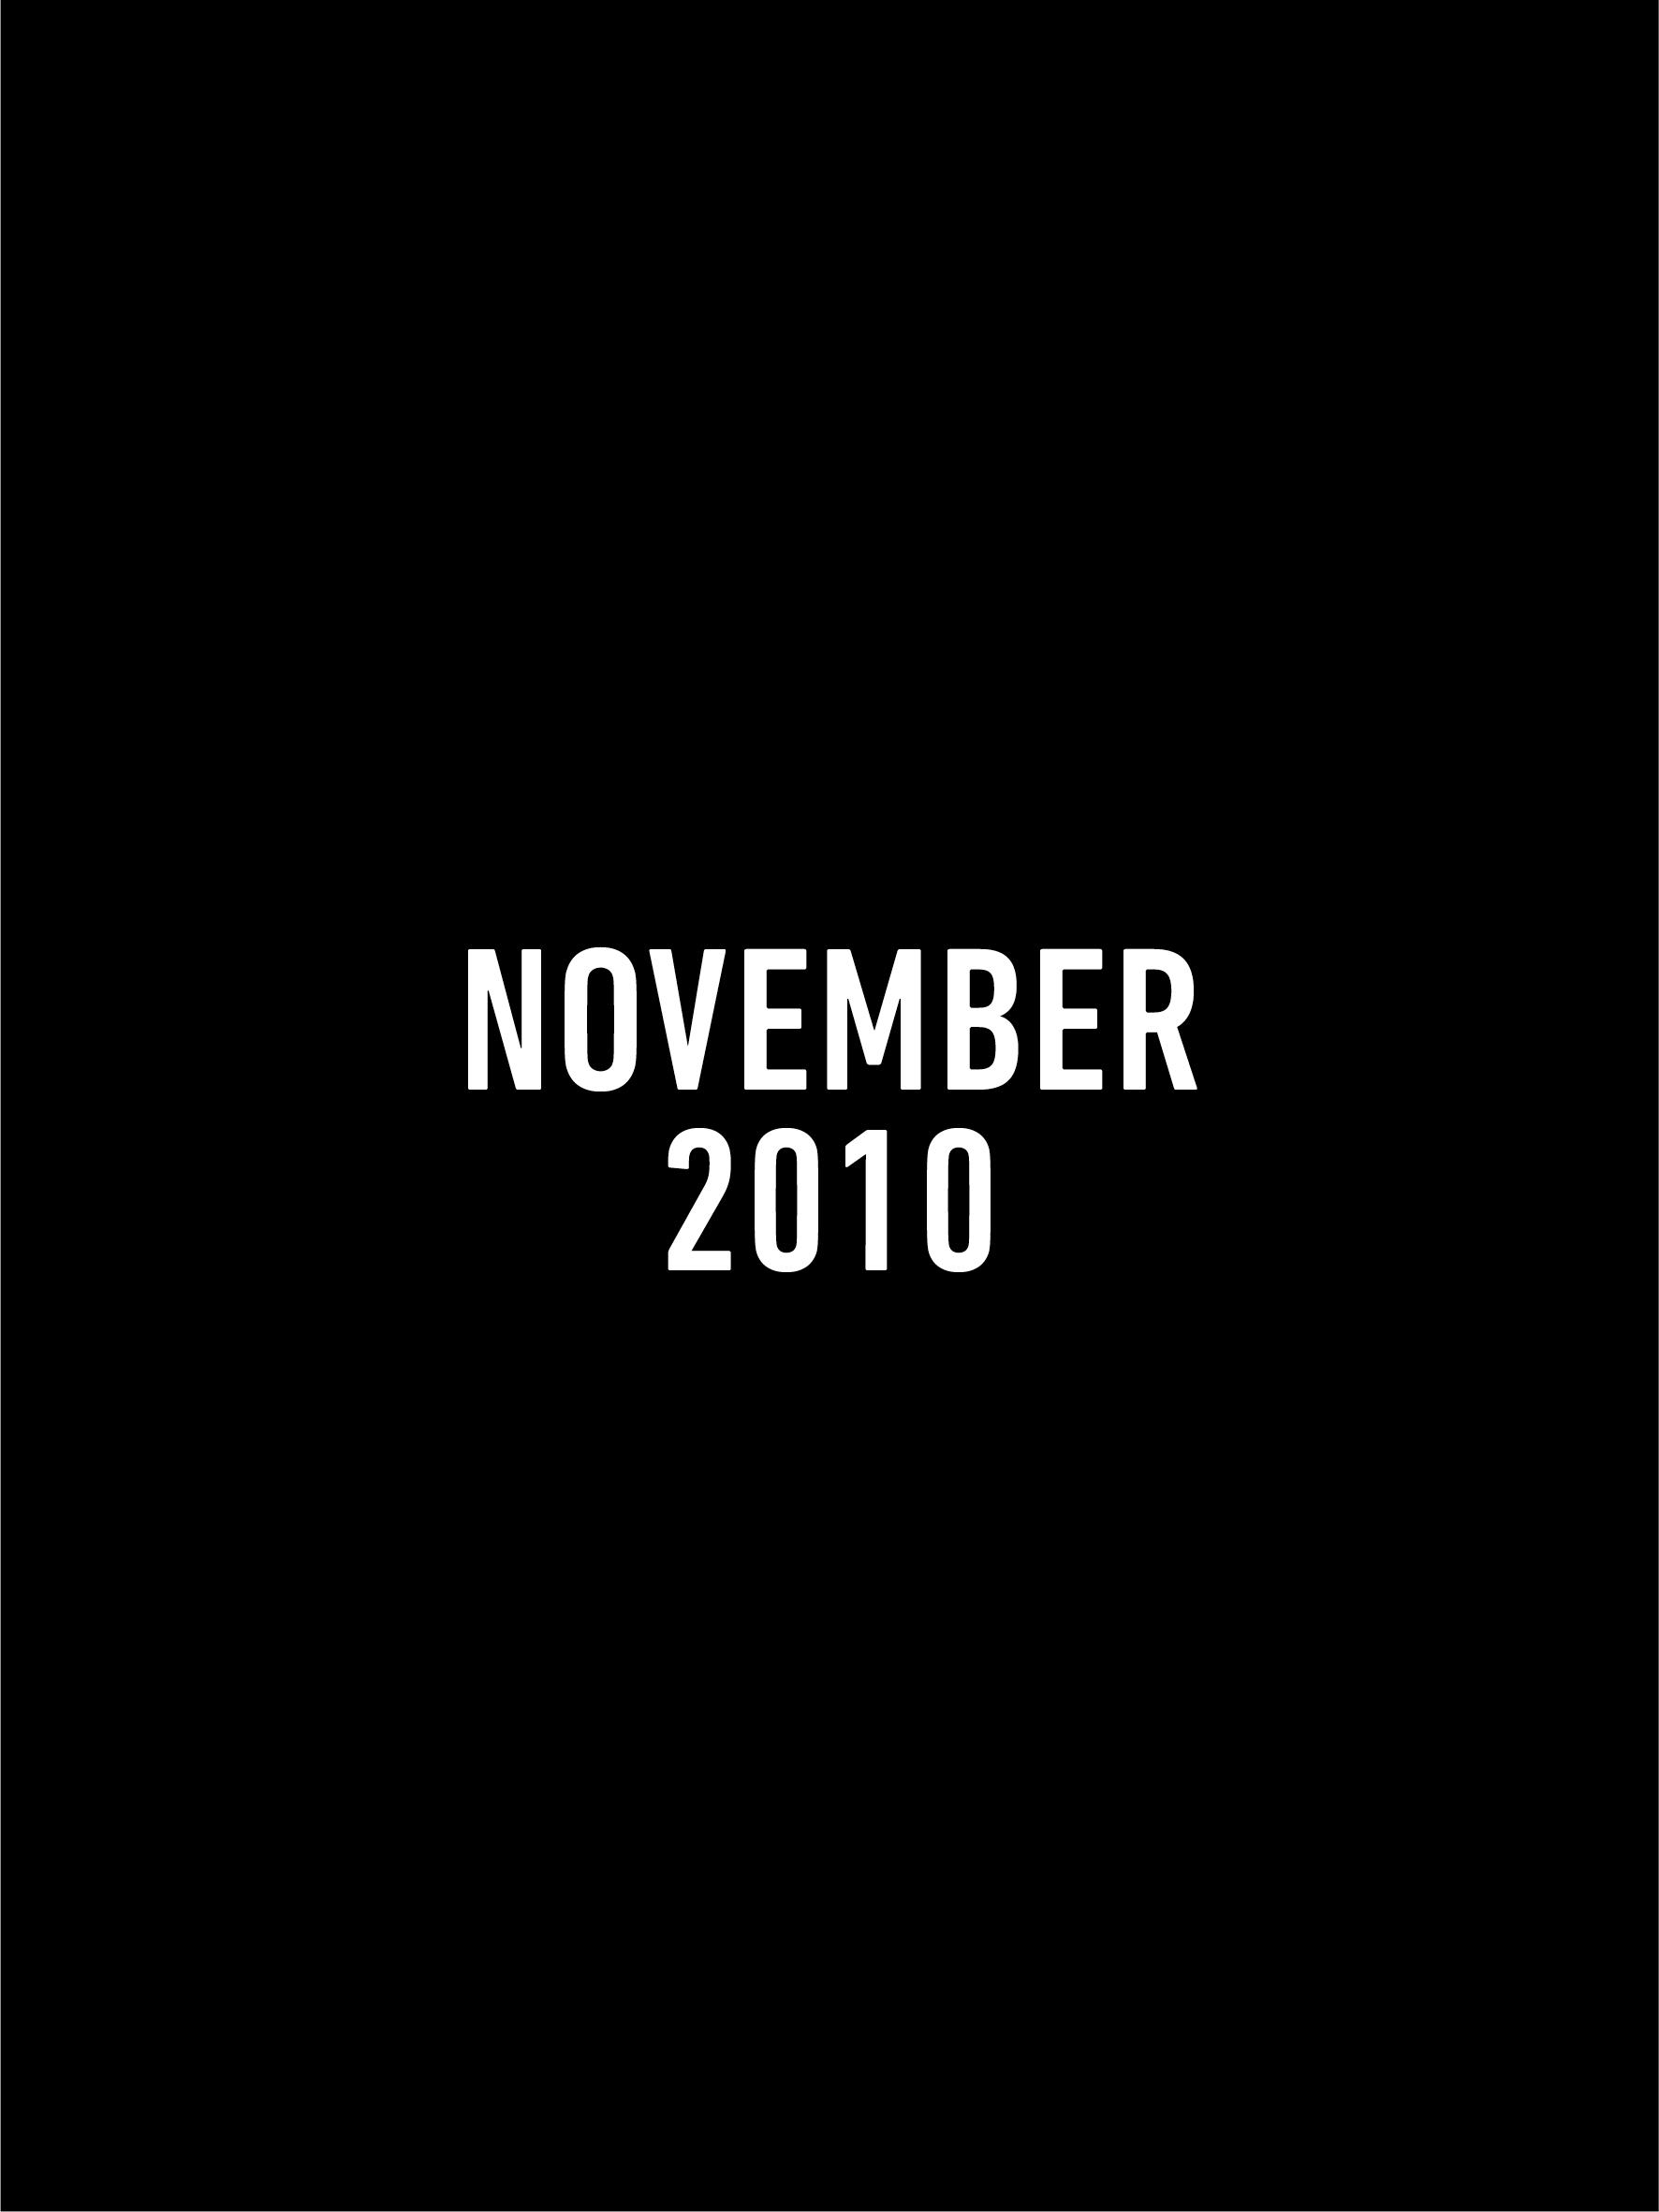 2010 monthly11.jpg